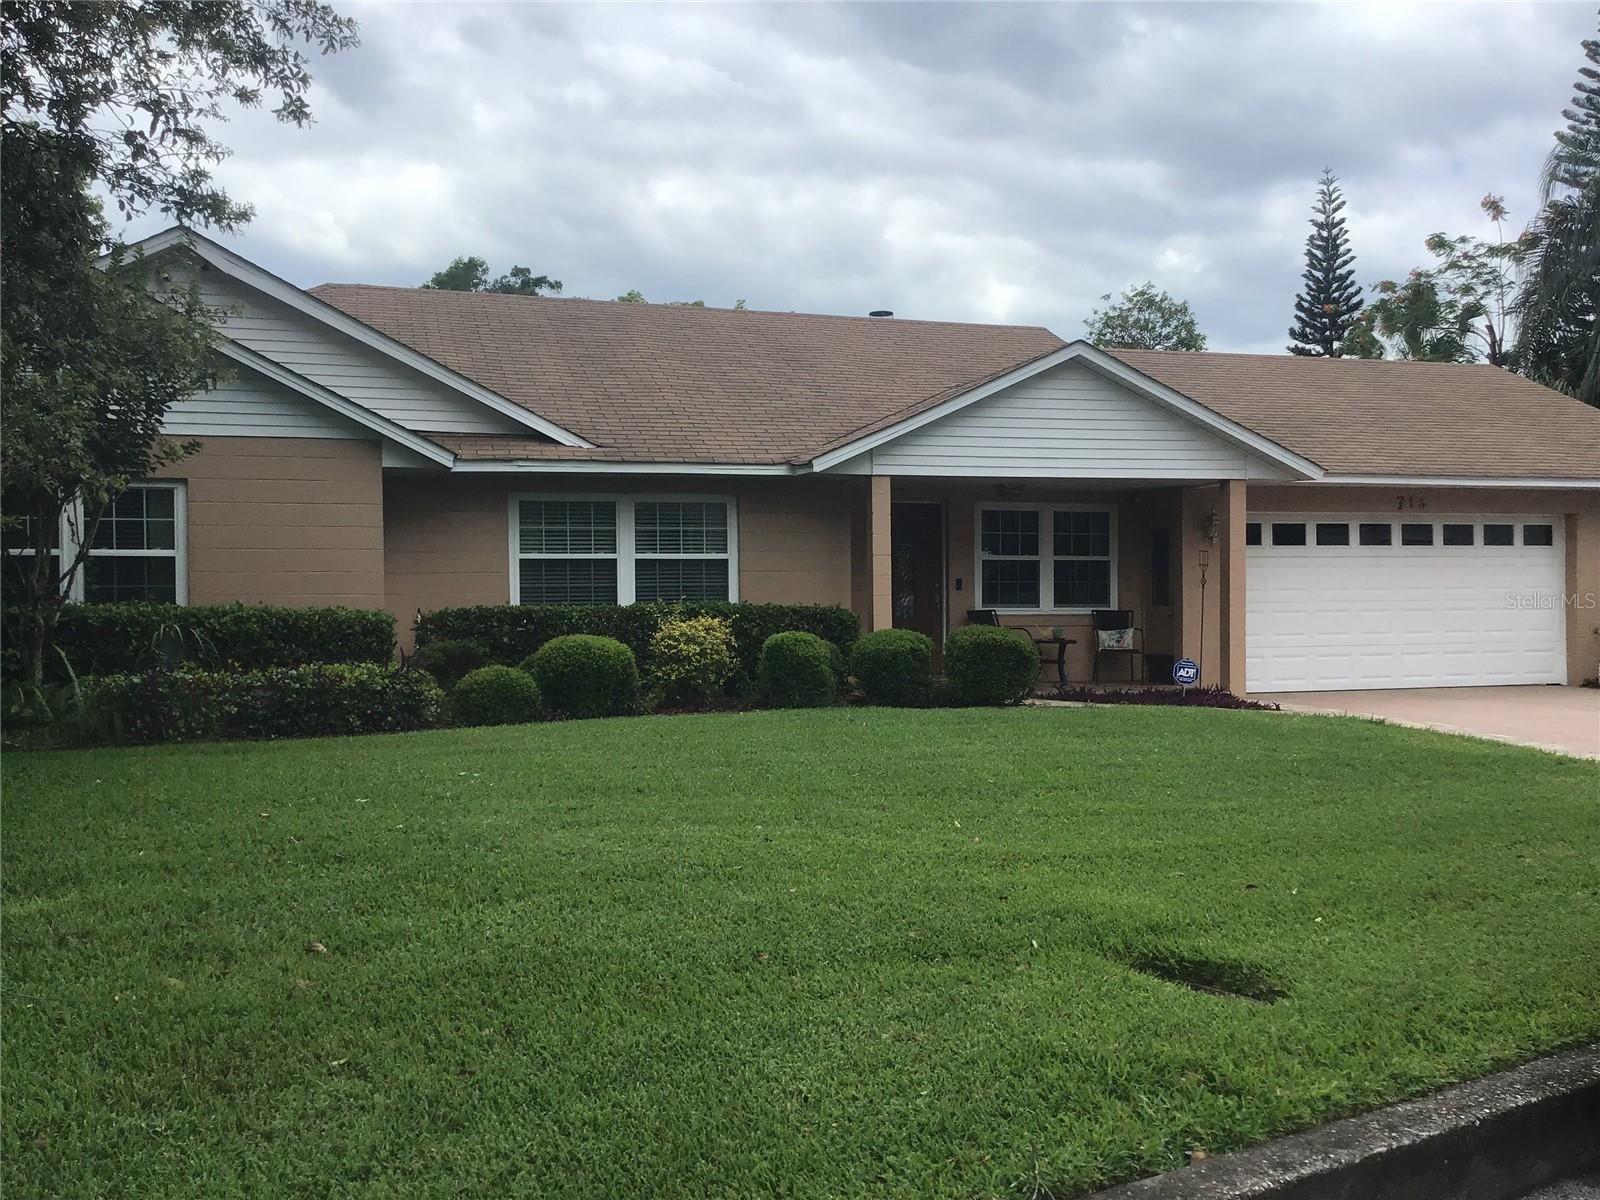 714 CLEMWOOD PLACE, Orlando, FL 32803 - MLS#: O5946951